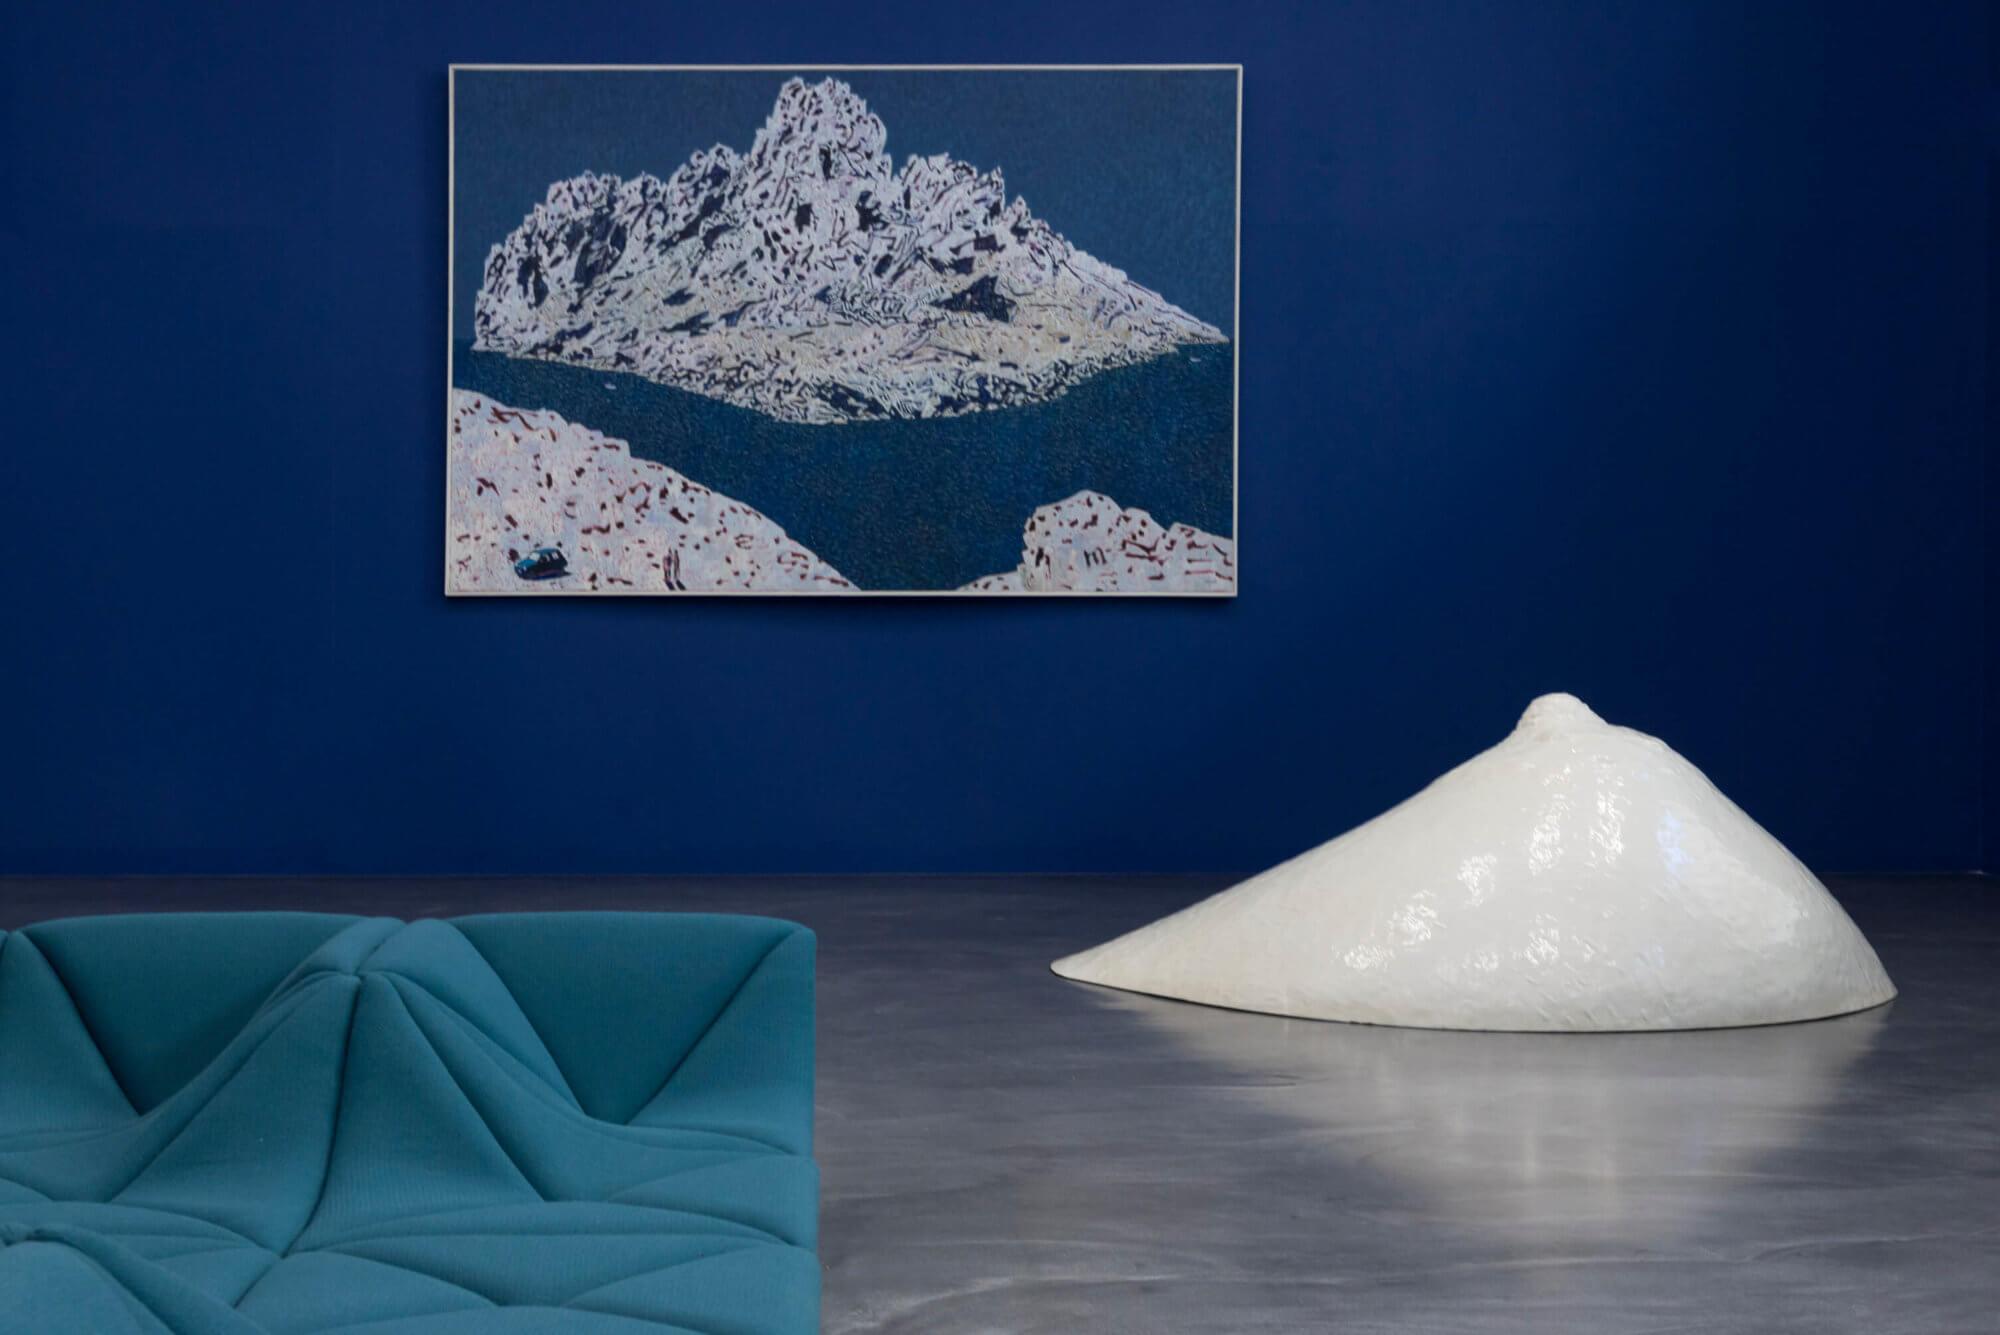 Bleus Méditerranée - India Mahdavi